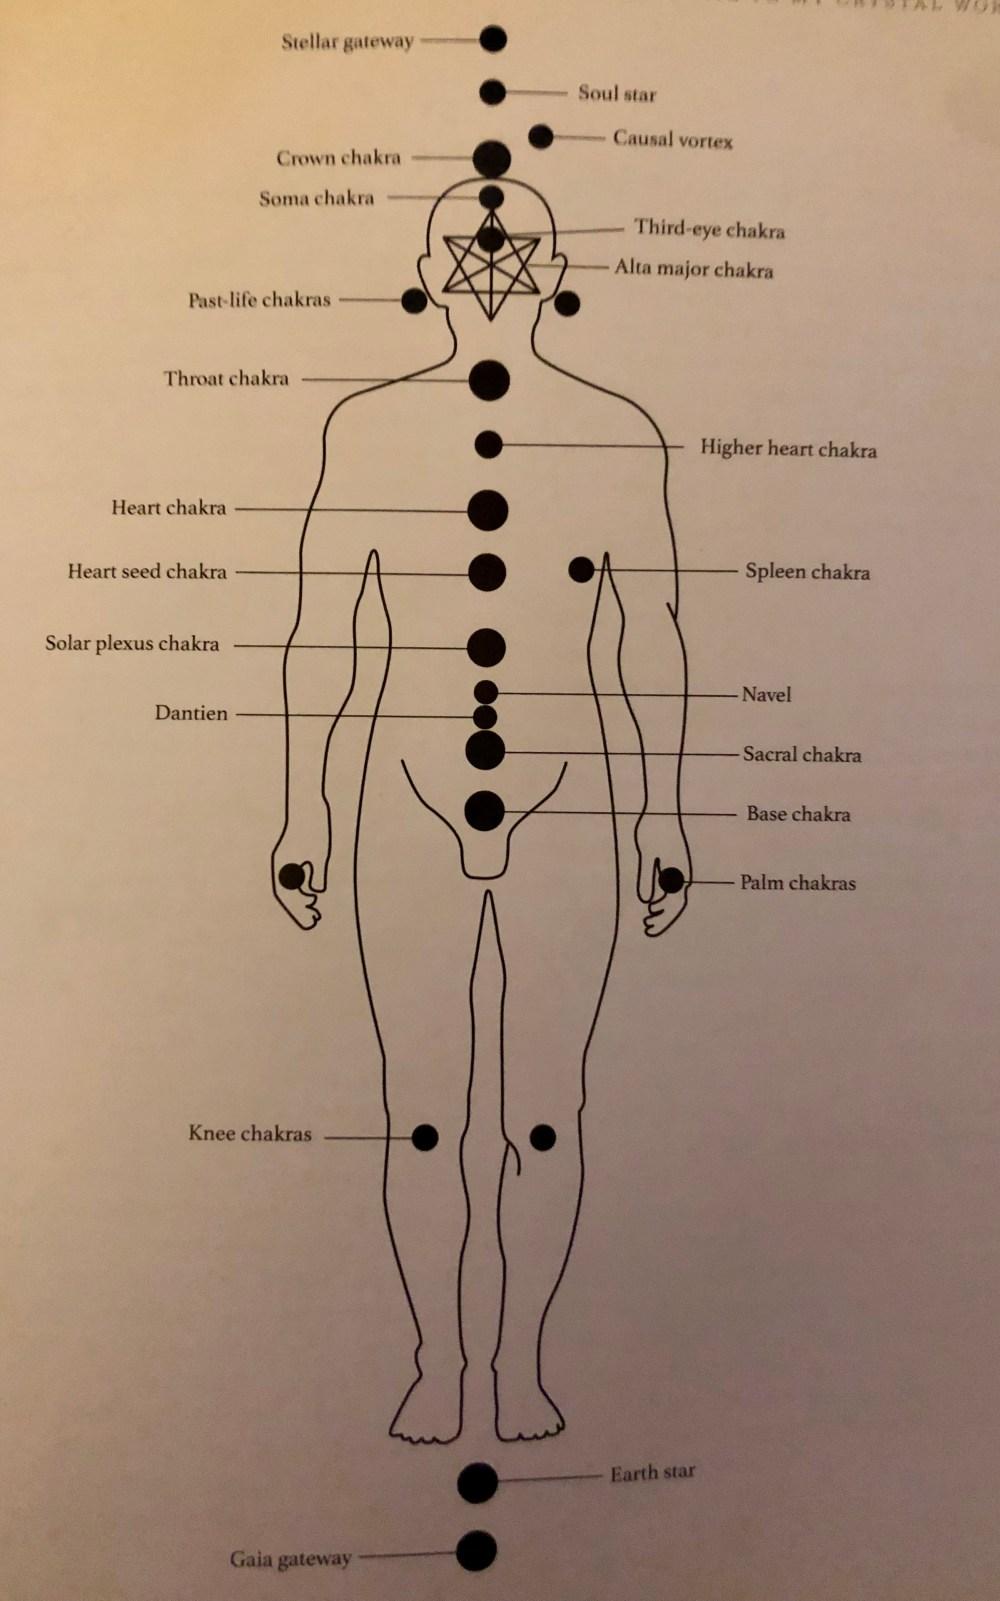 medium resolution of new podcast episode on the full 21 chakra system jill roberts psychic medium